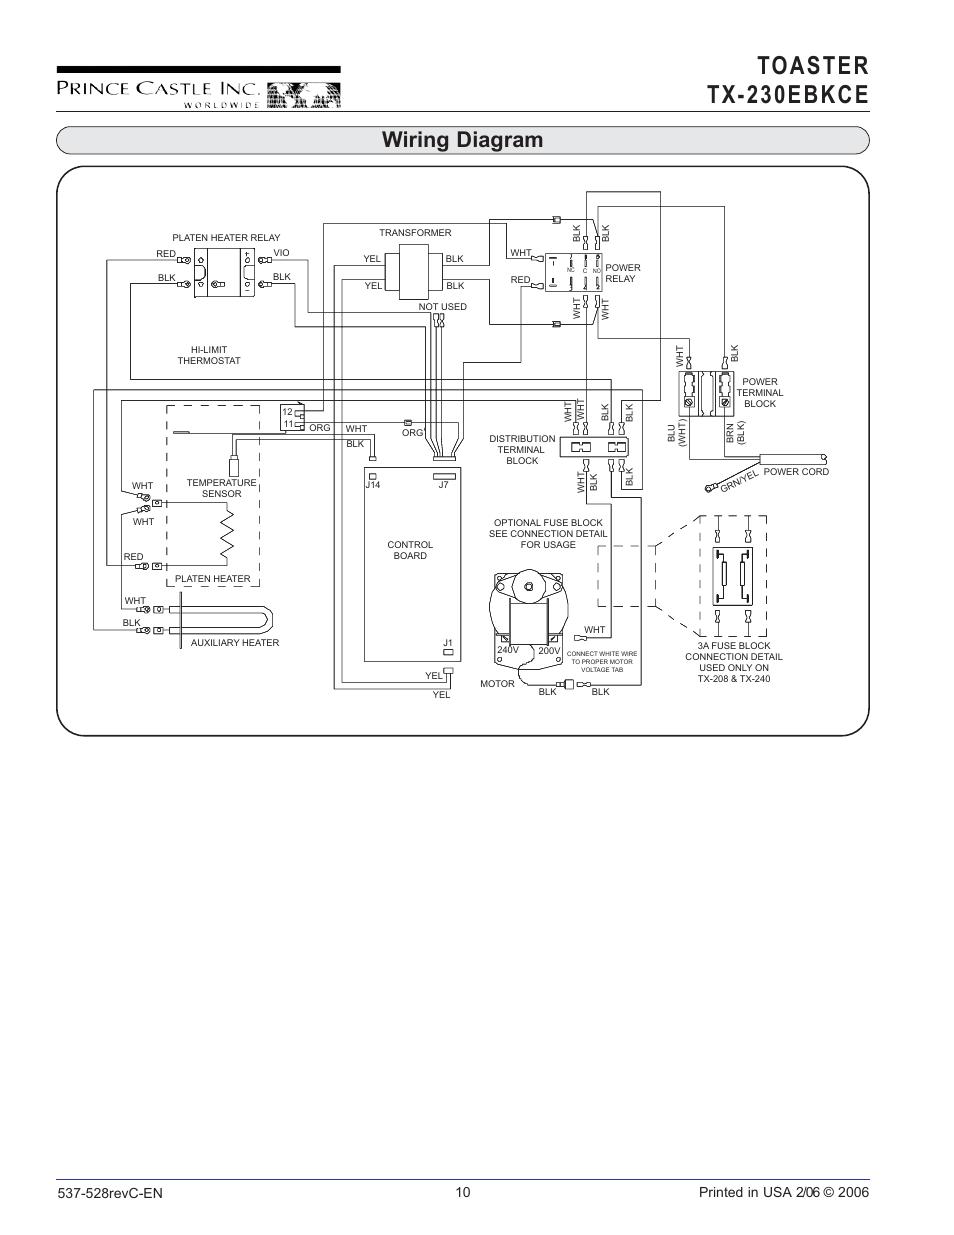 medium resolution of toaster tx 230 ebkce wiring diagram prince castle tx 230ebkce user manual